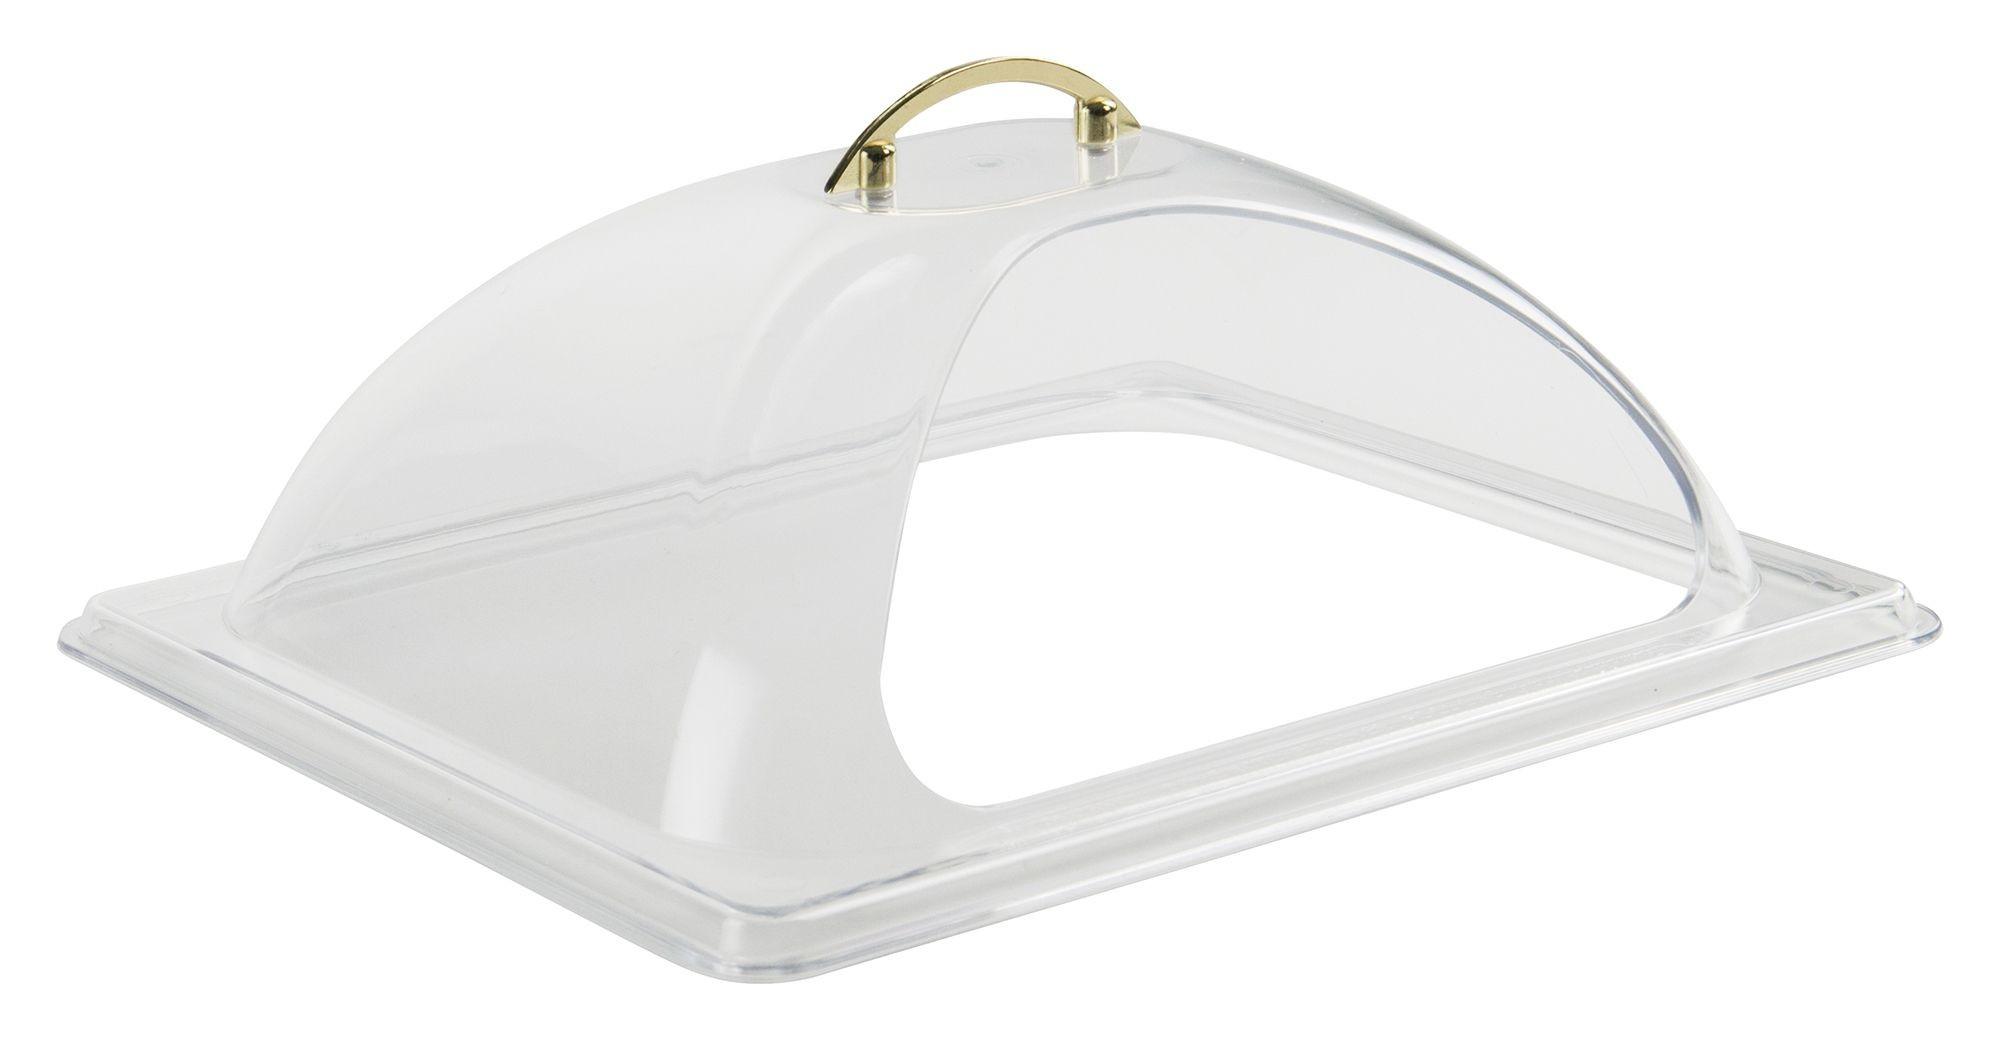 Winco C-DPF2 Polycarbonate Half Size Dome Cover with Side Cut